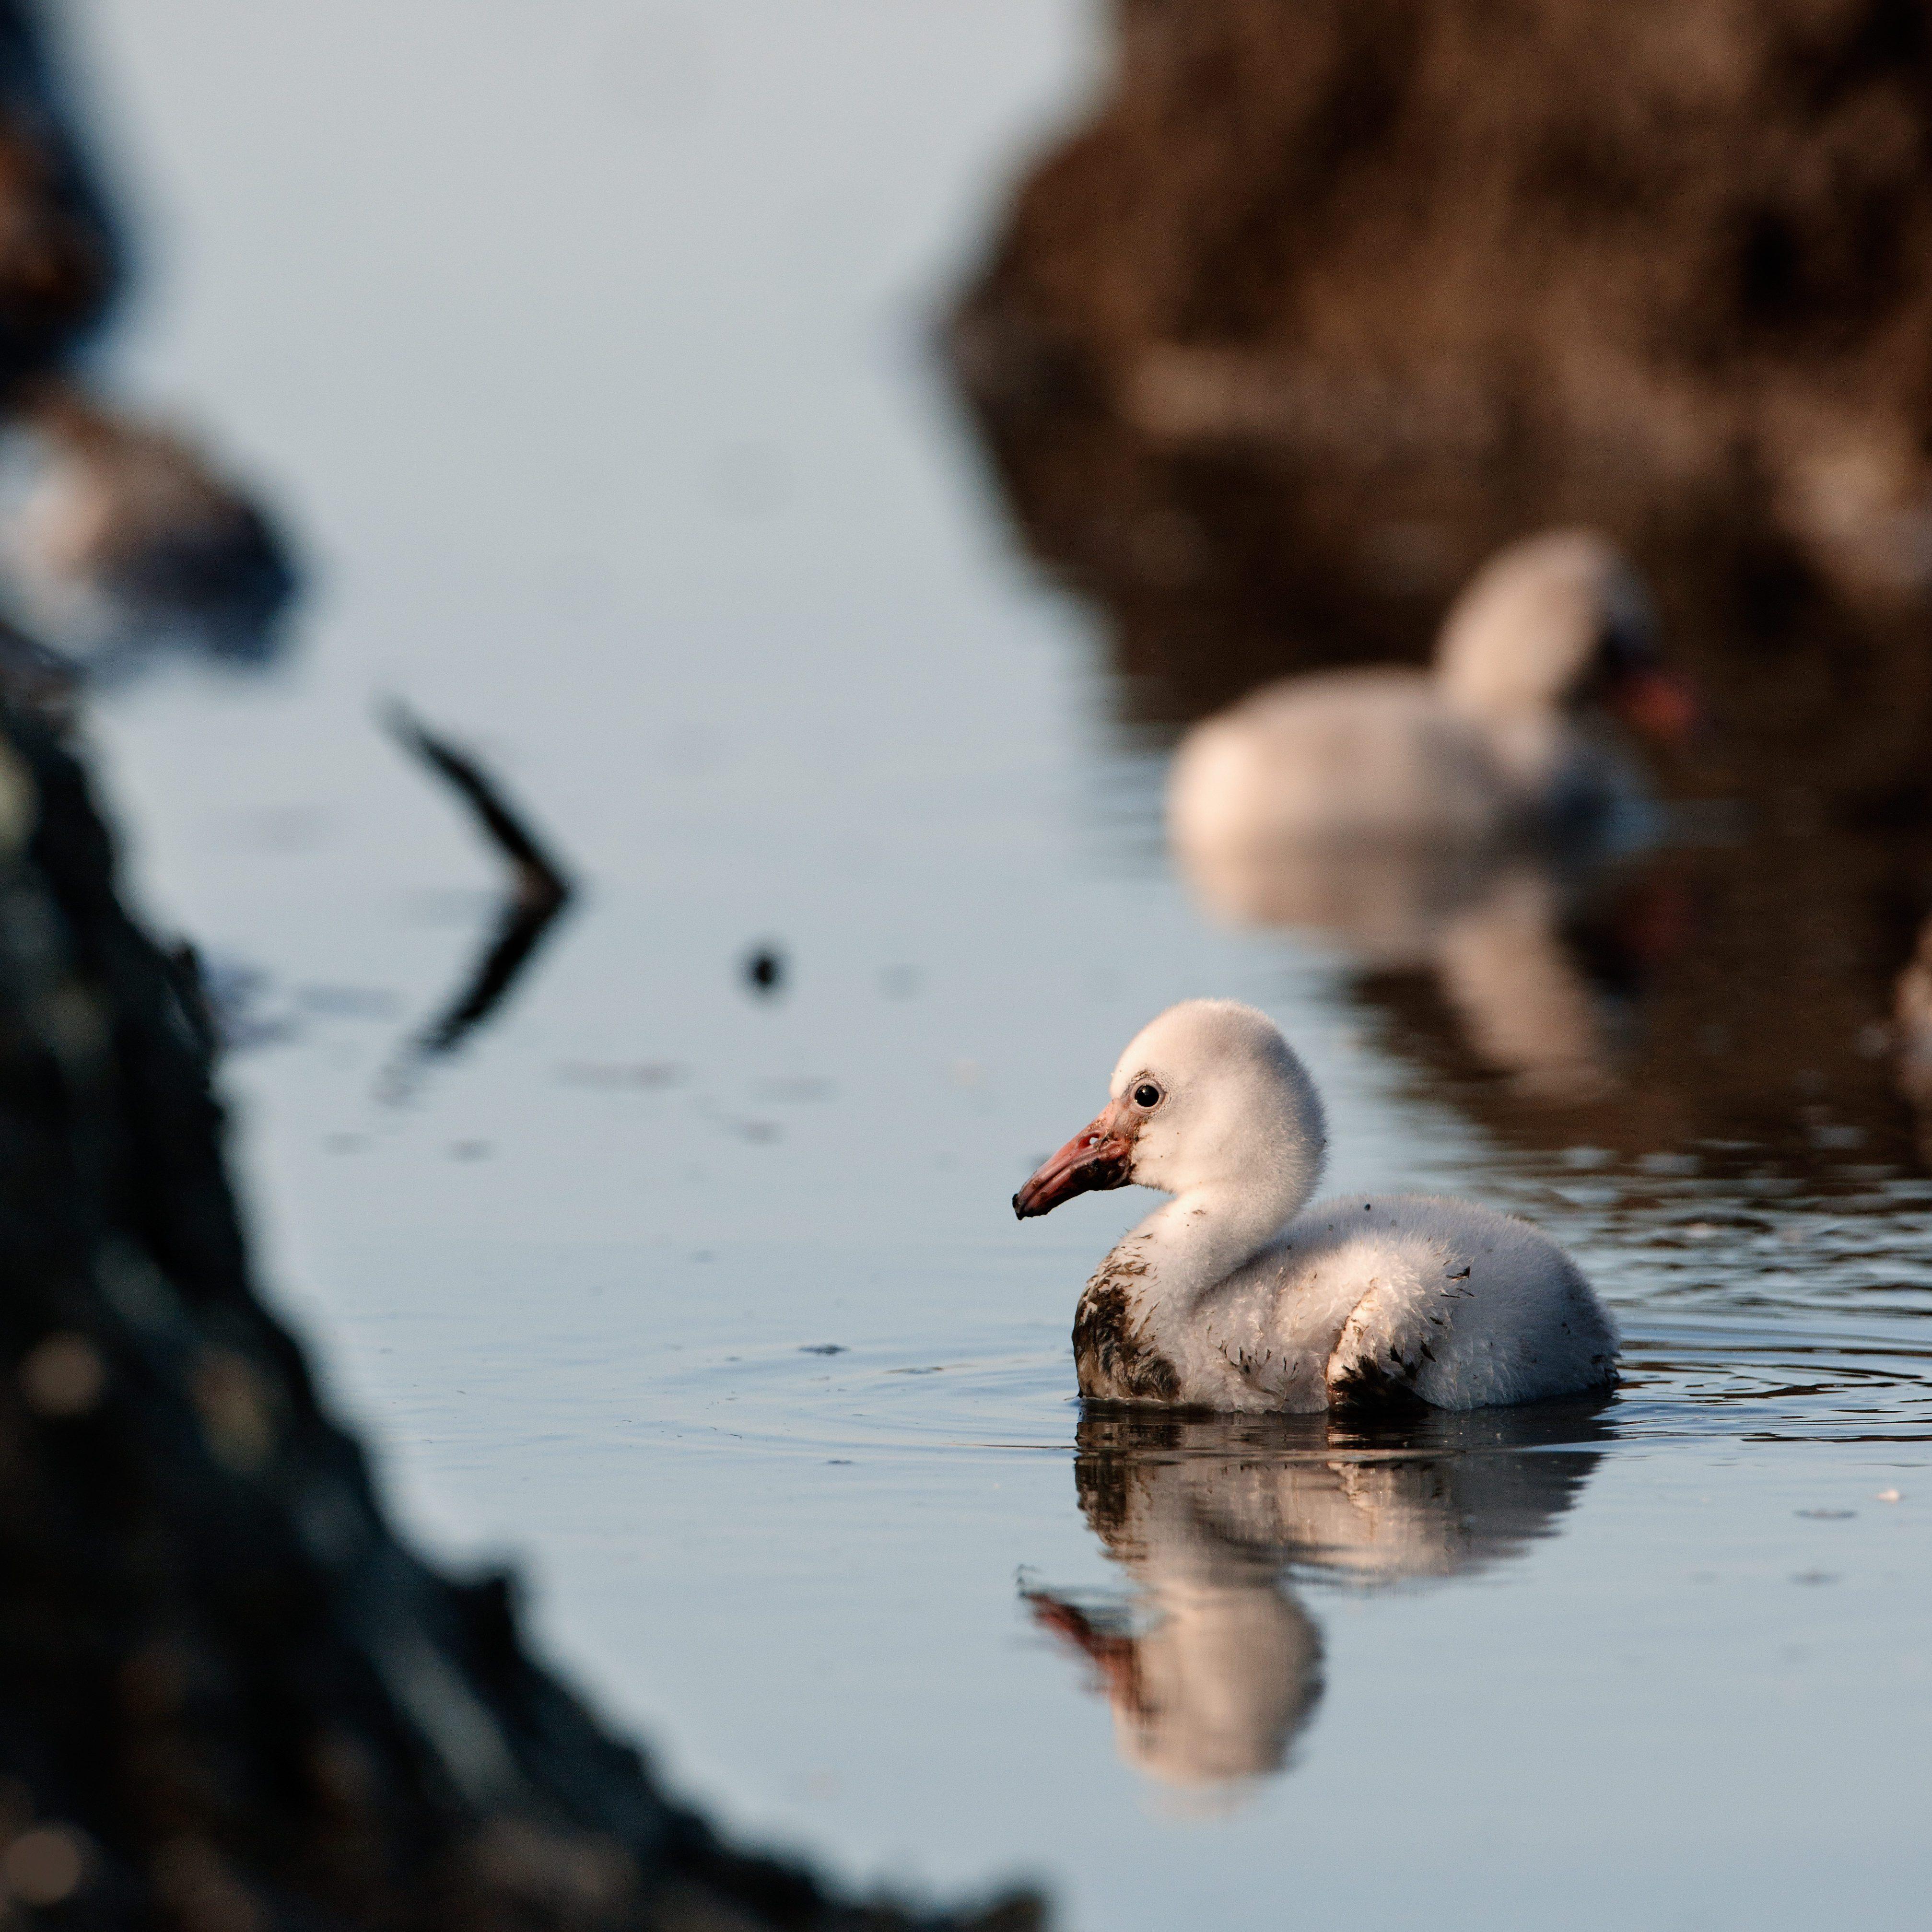 Little newborn flamingos